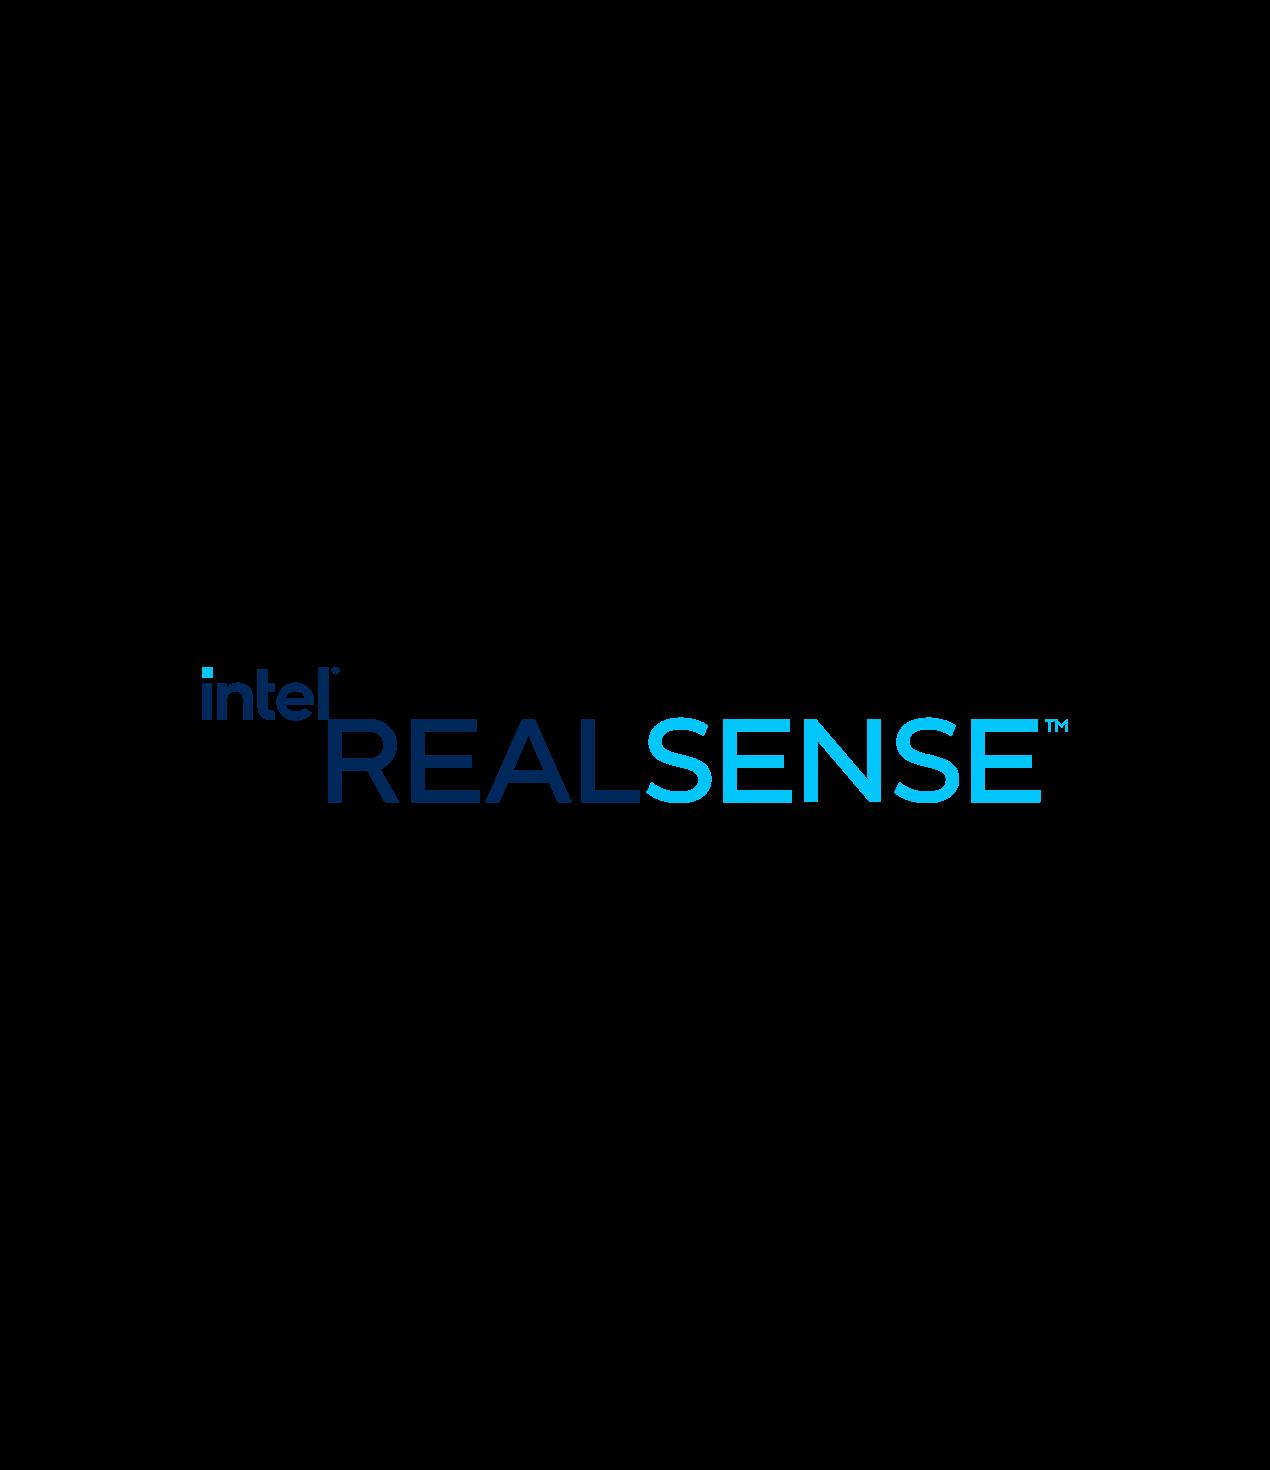 Intel RealSense LiDAR camera L515 and DIM Weight Software Bundle